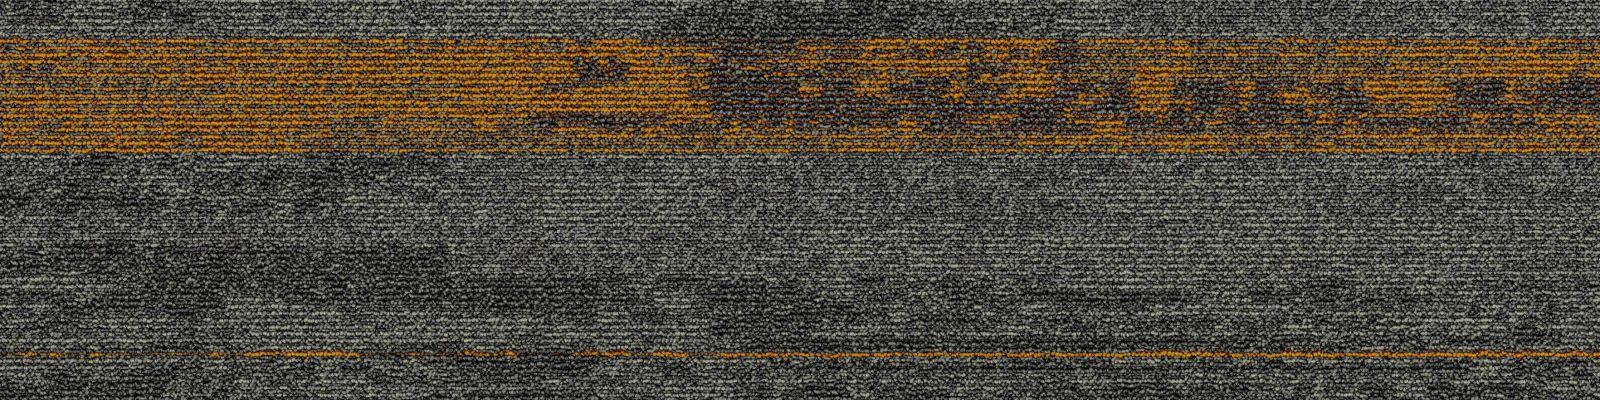 thảm skywalk 403